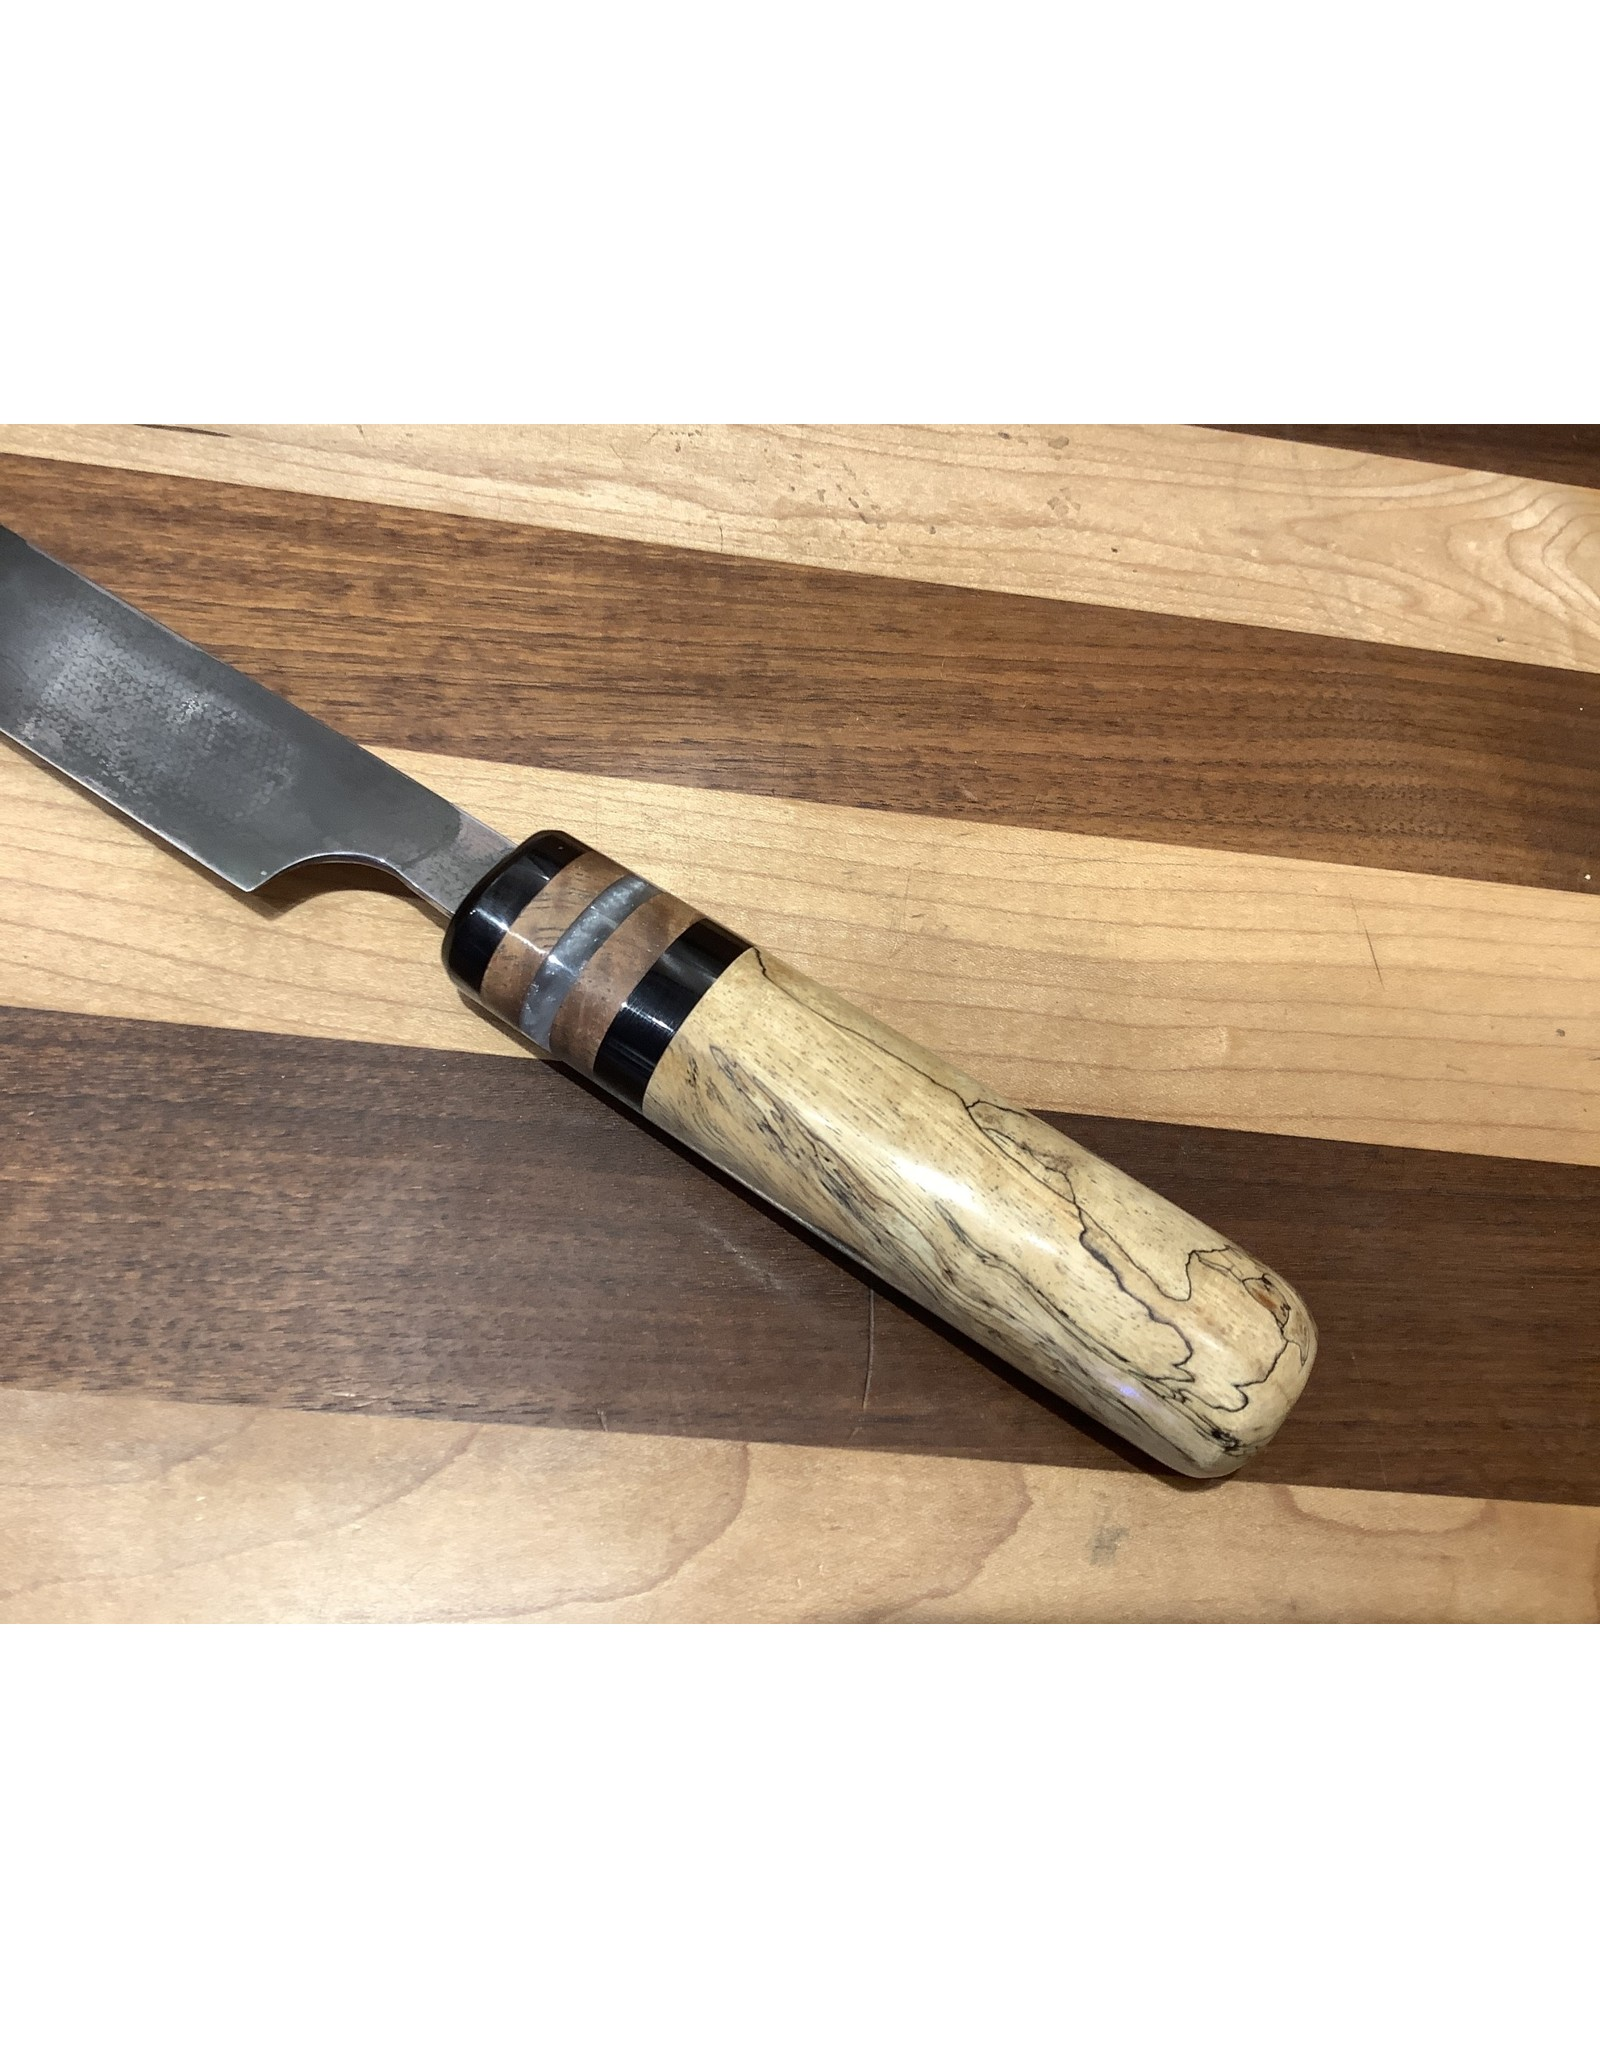 Serenity Wa Handle Yanagiba with a hand rubbed and buffed forge finish